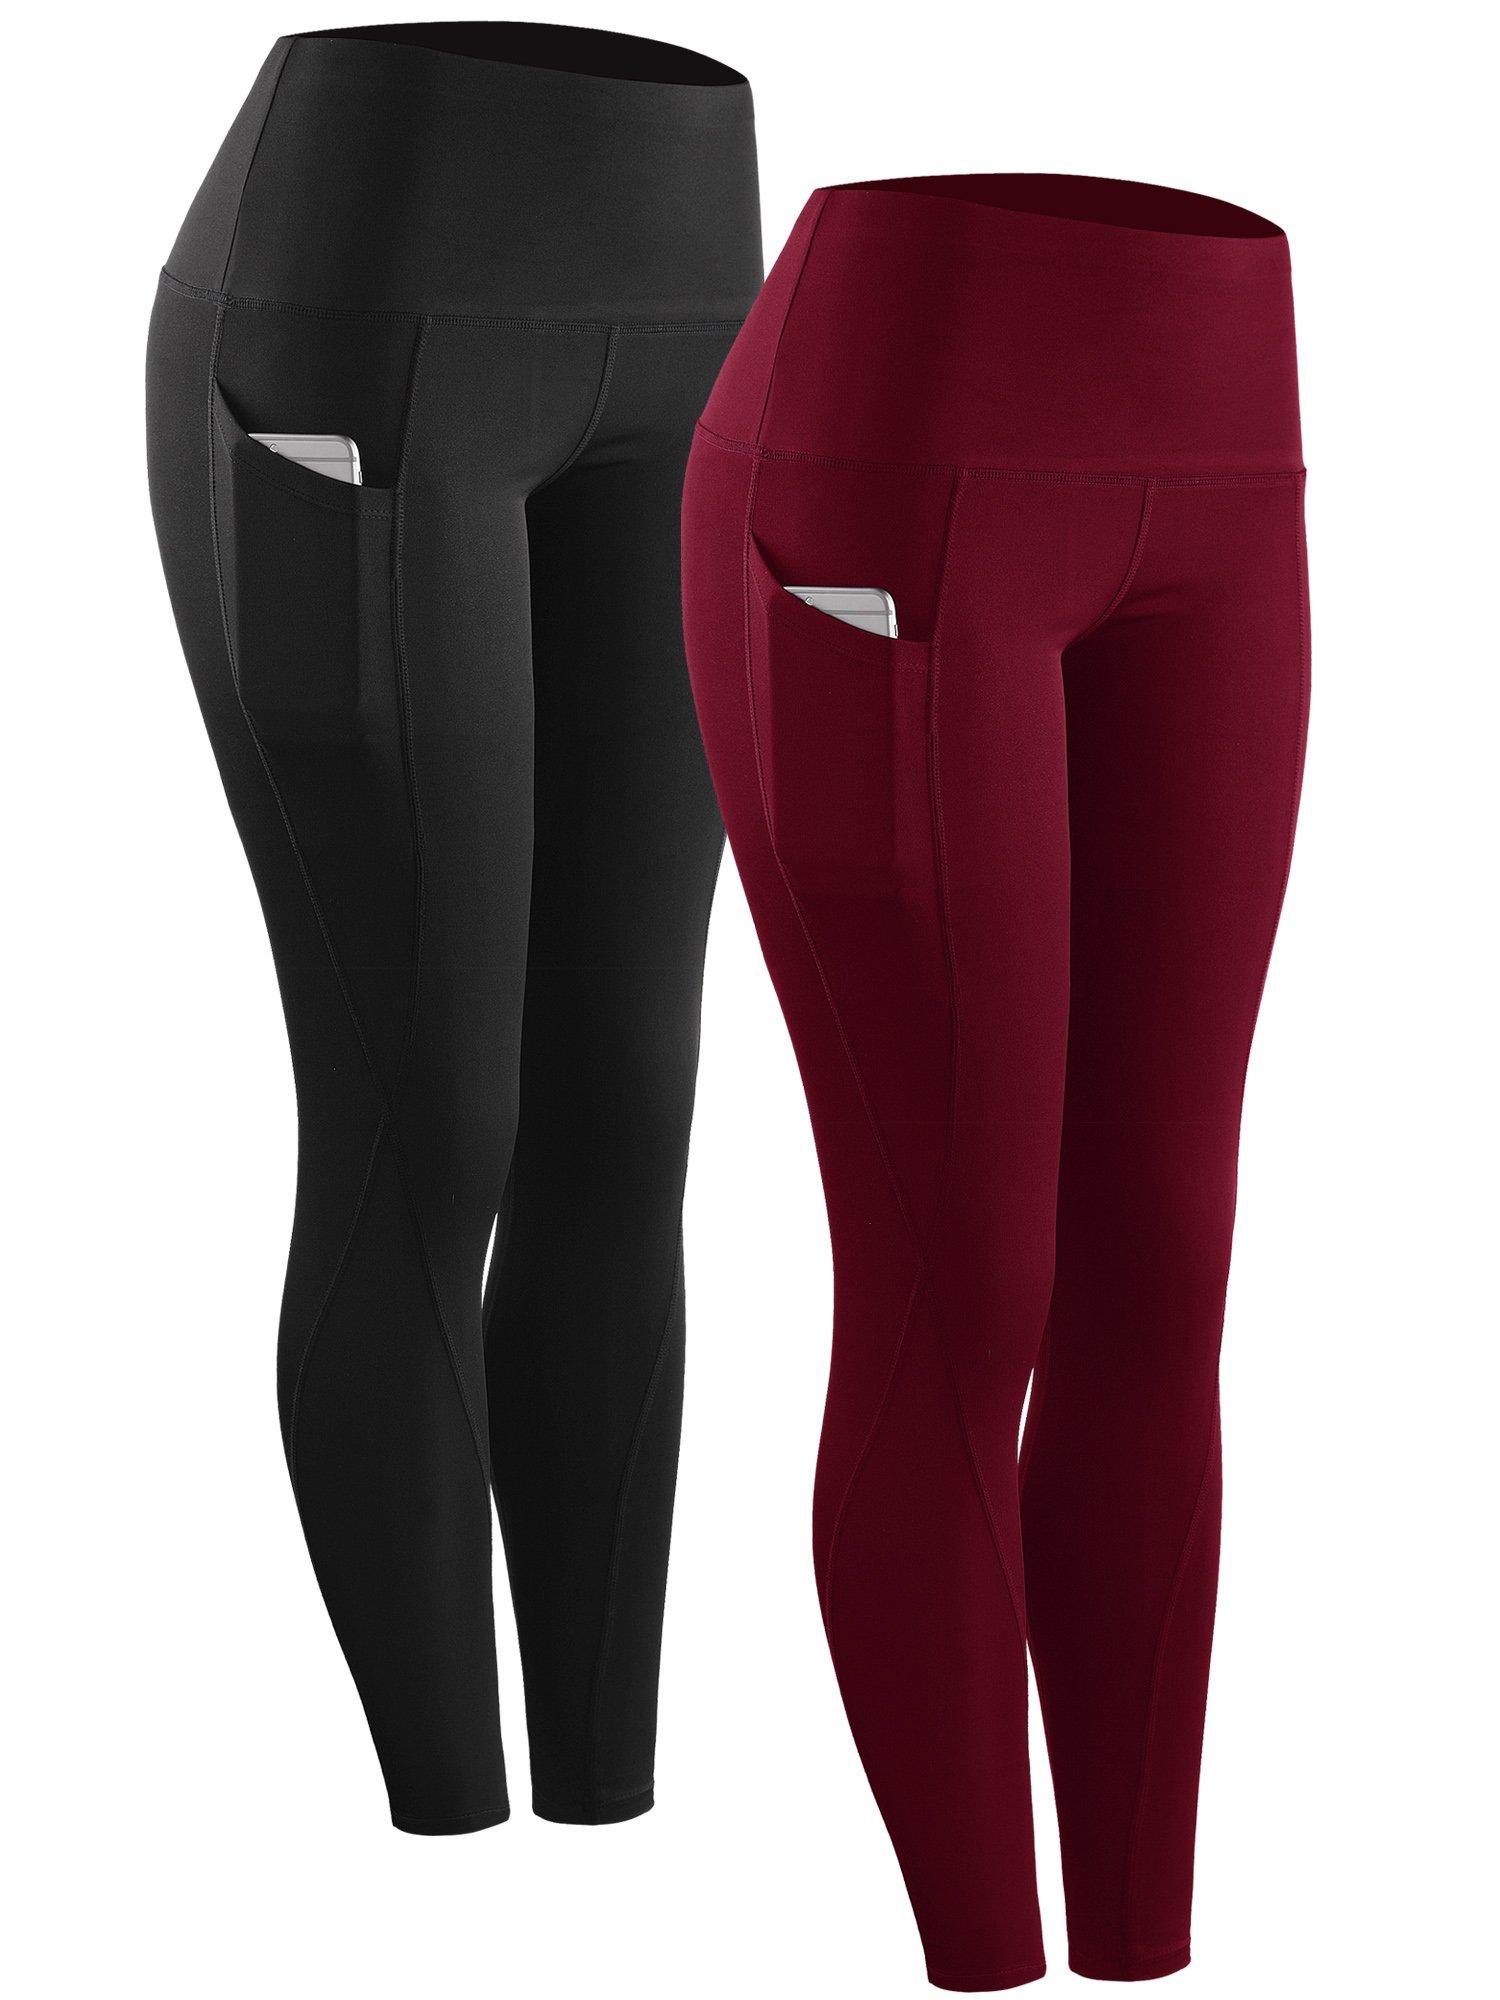 Neleus 2 Pack Tummy Control High Waist Running Workout Leggings,9017,2 Pack,Black,Red,US S,EU M